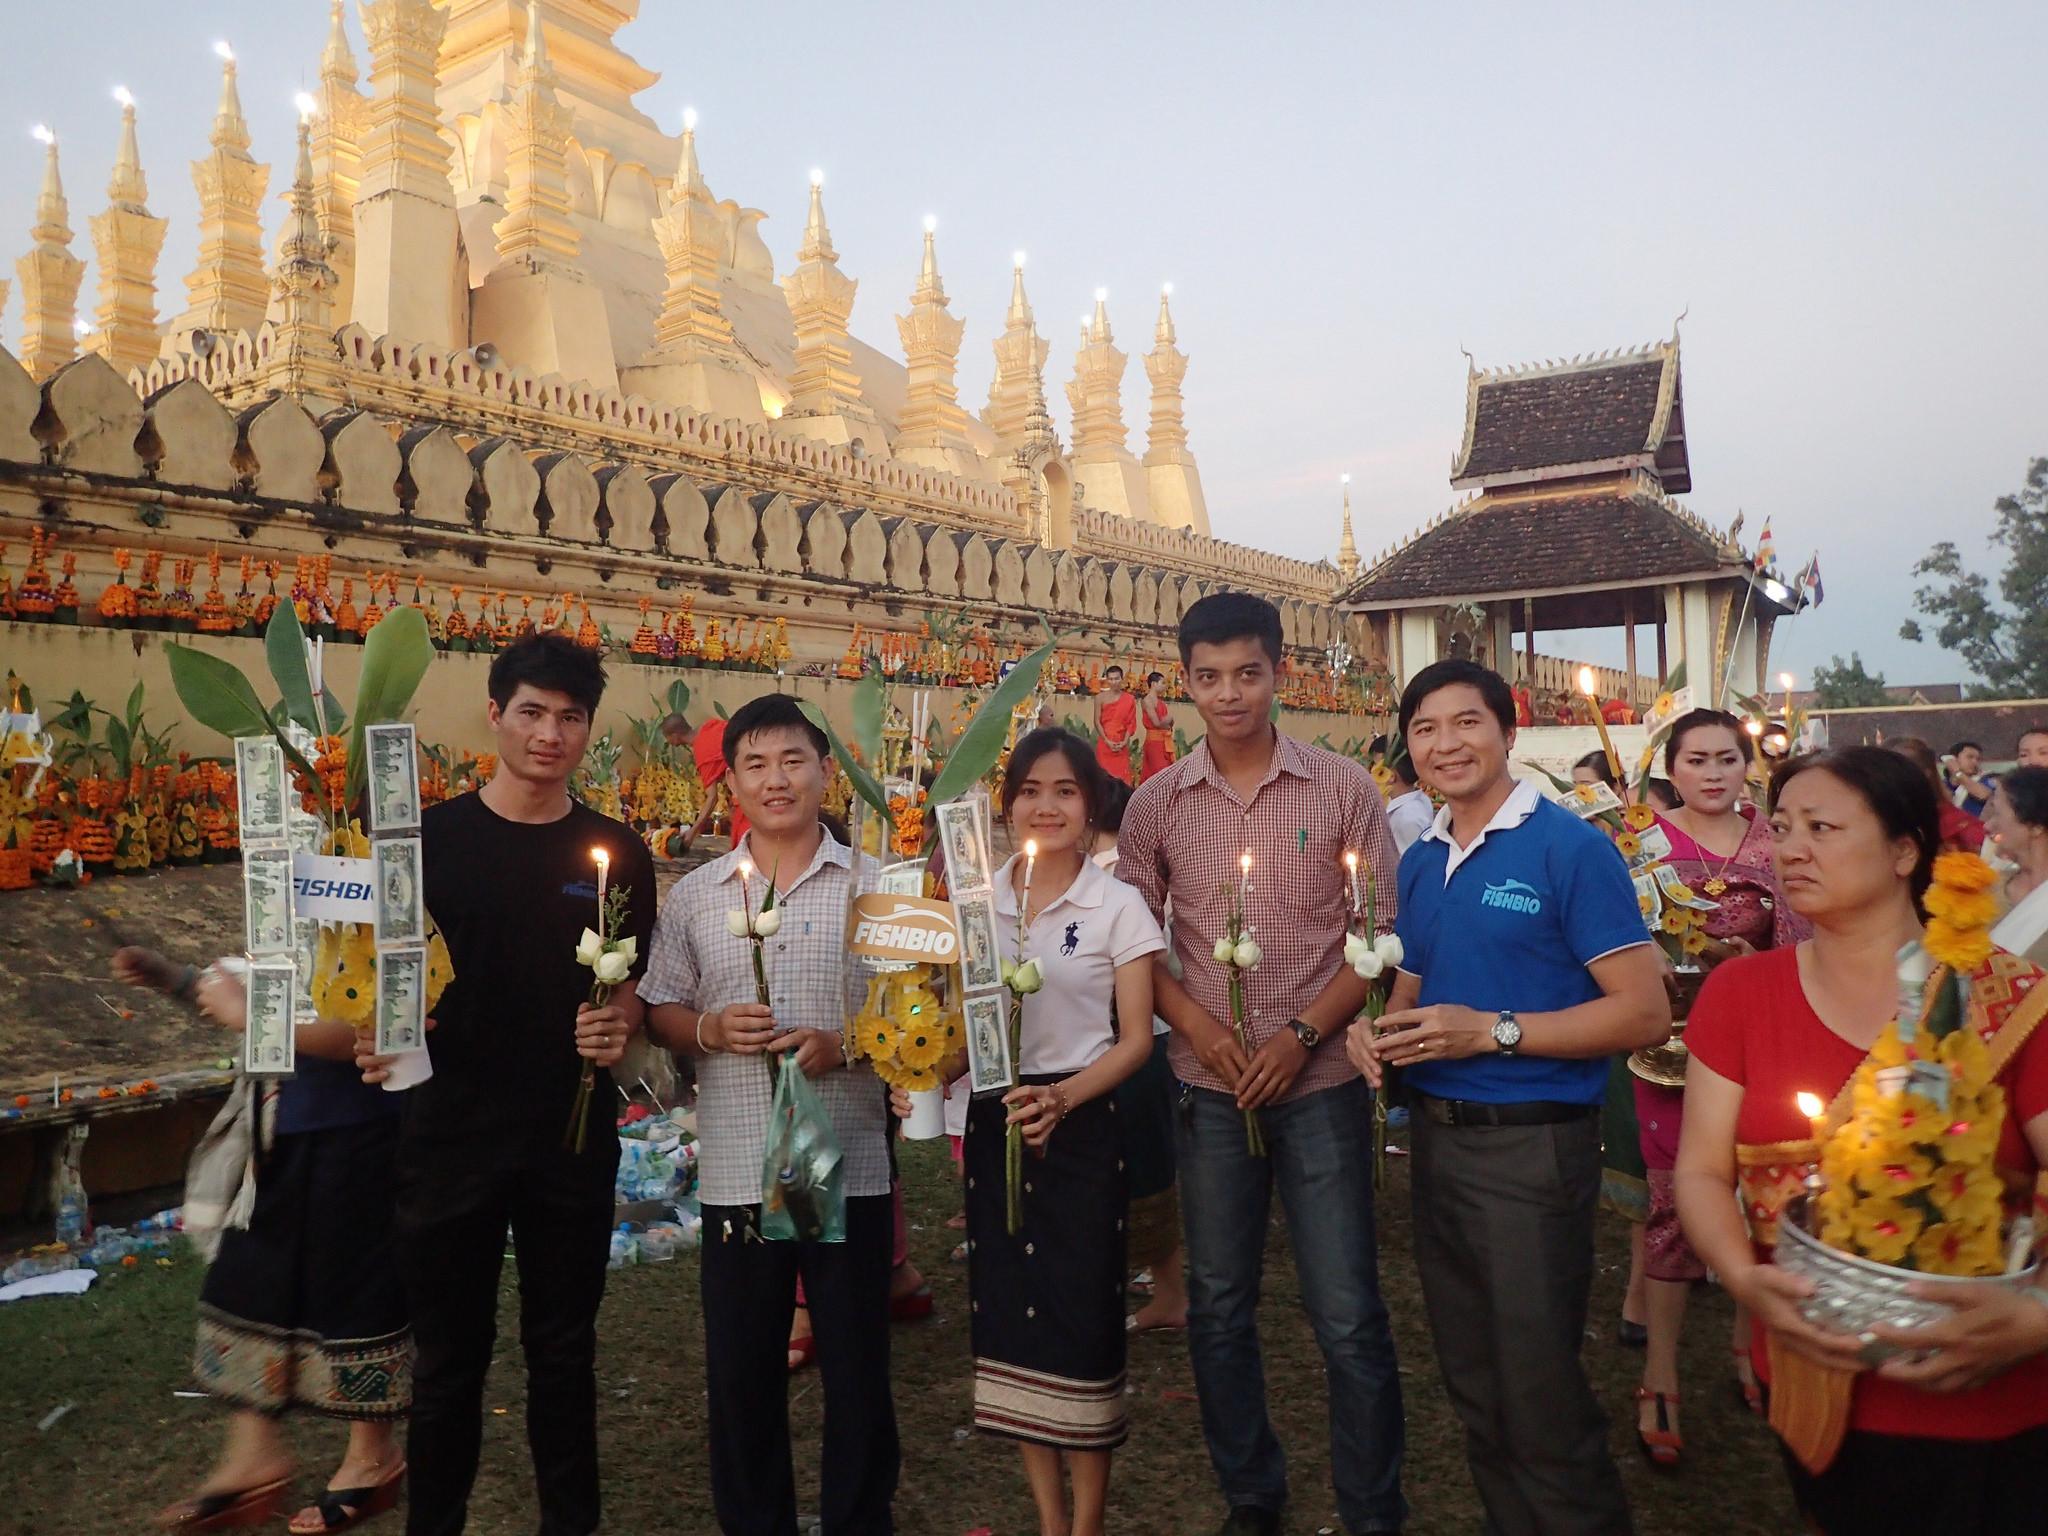 FISHBIO Laos staff